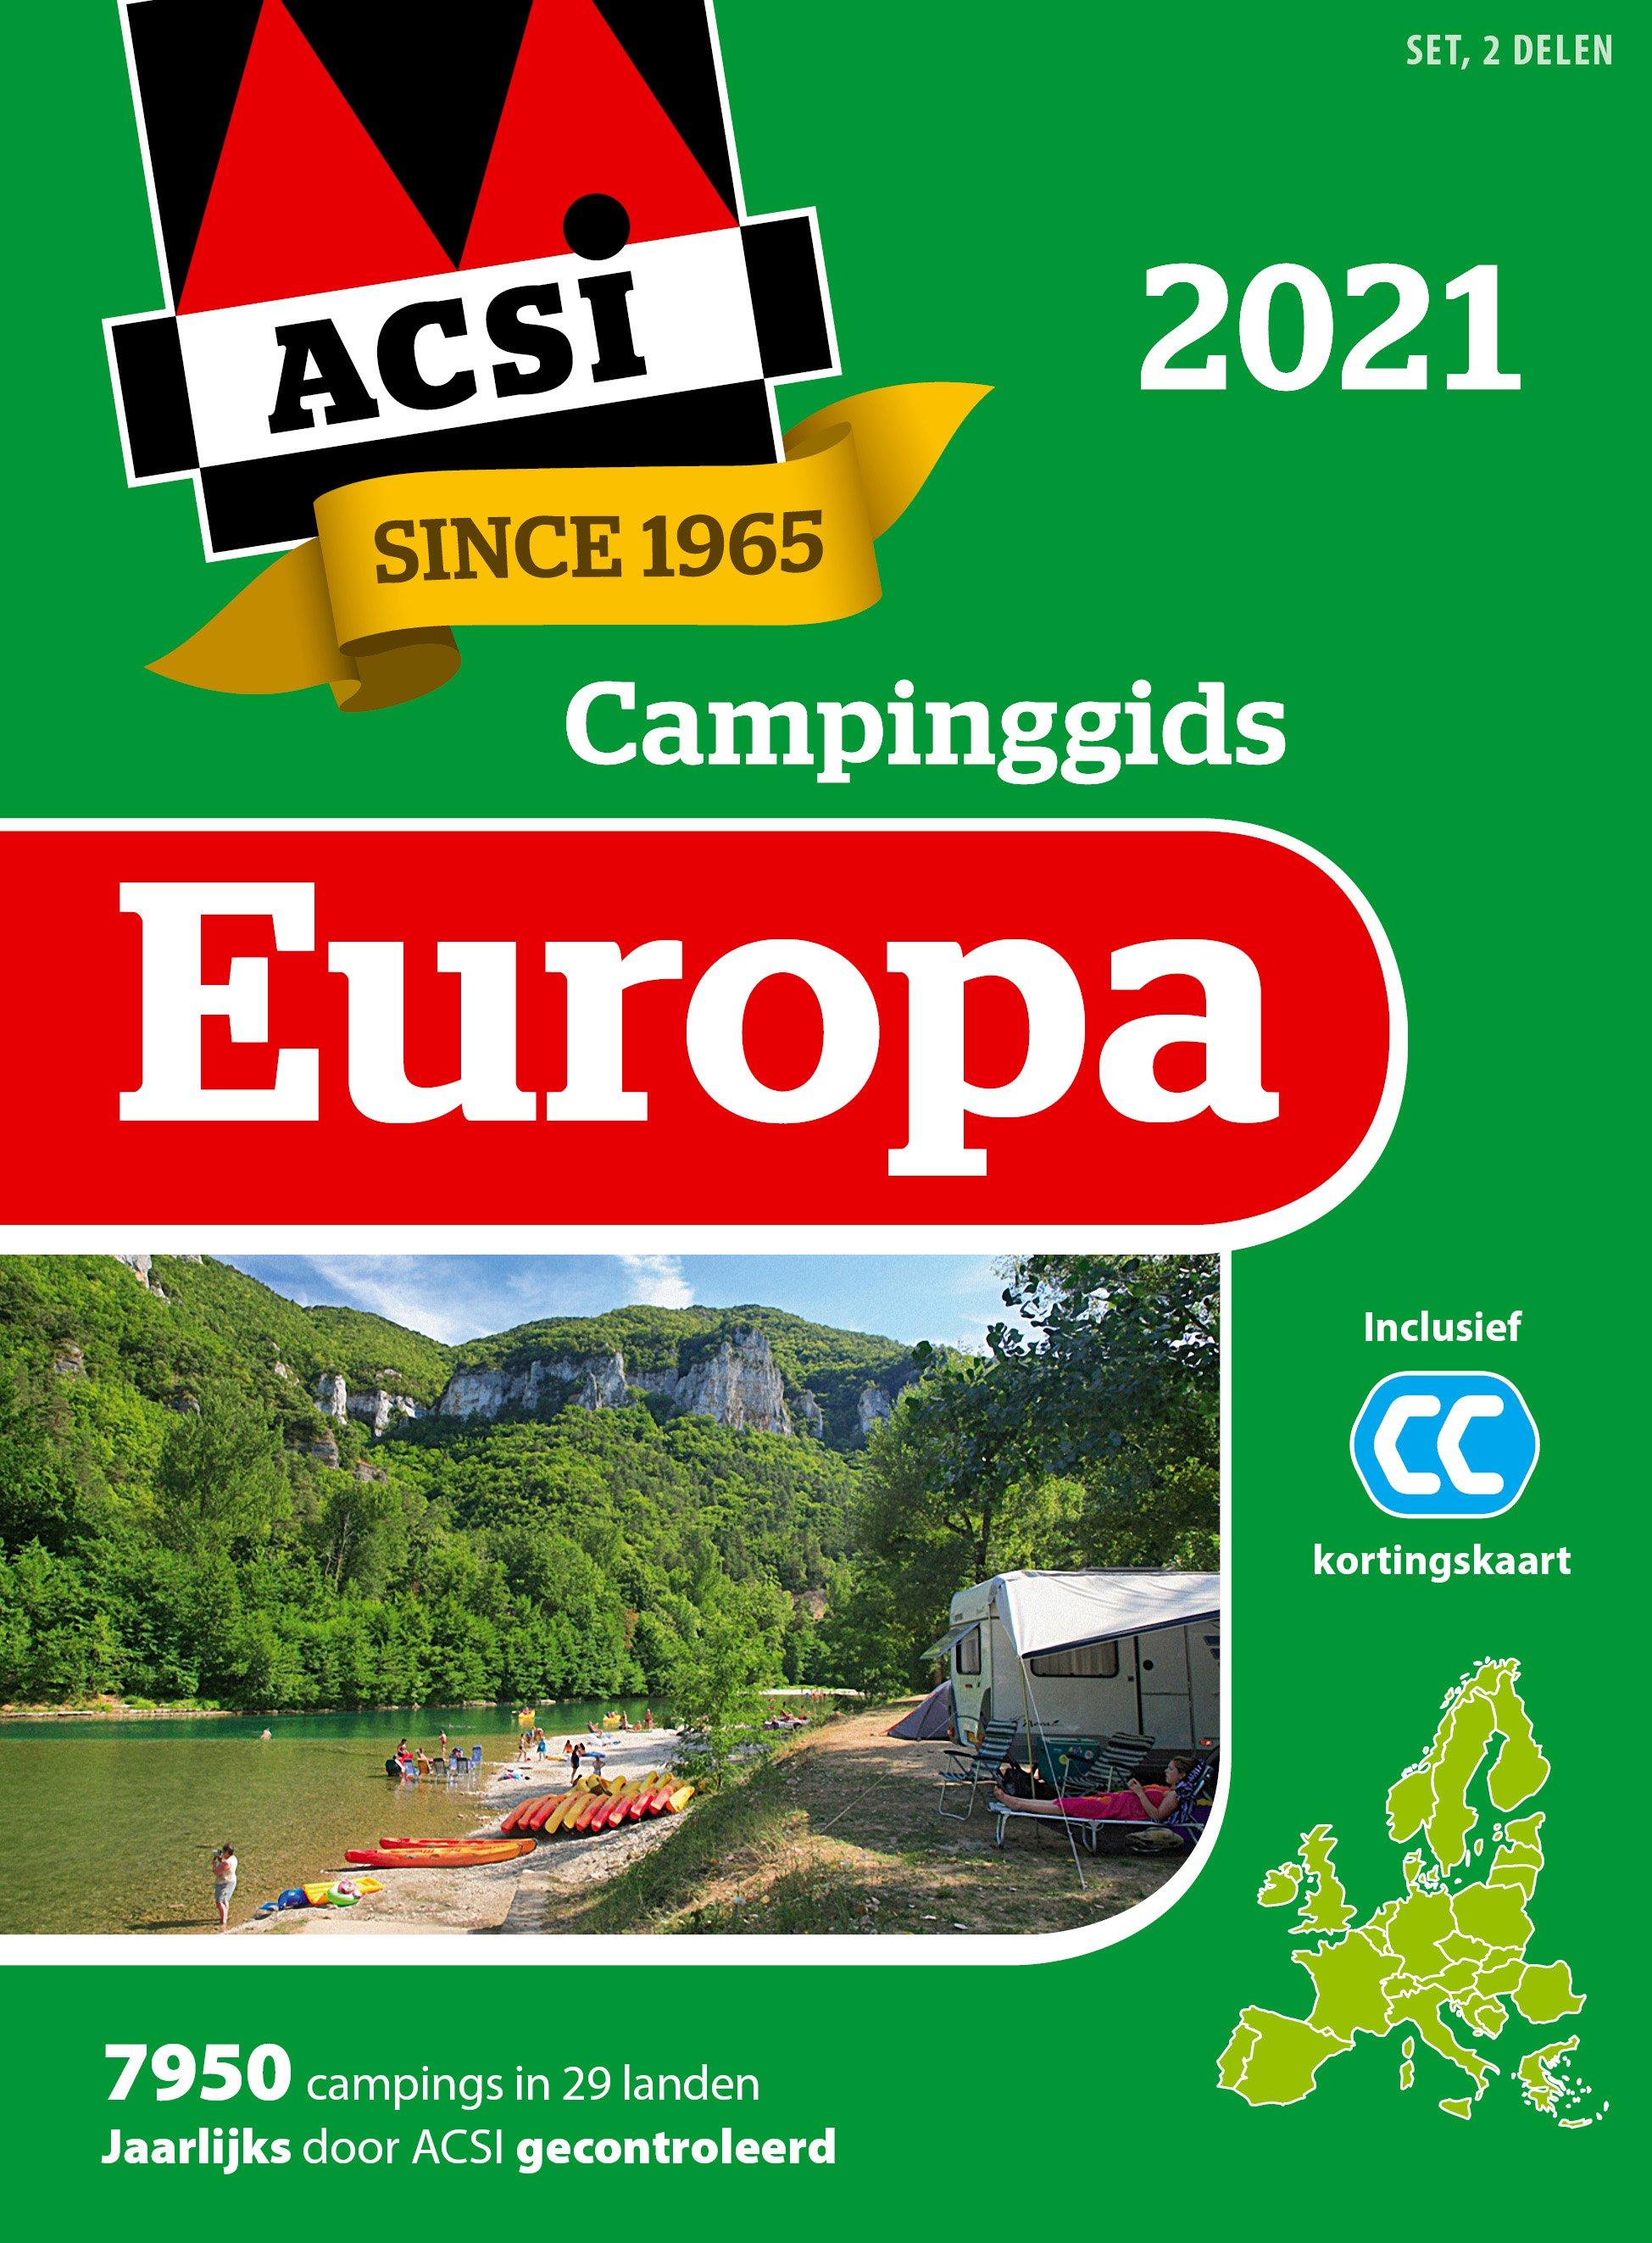 Campinggids europa 2021